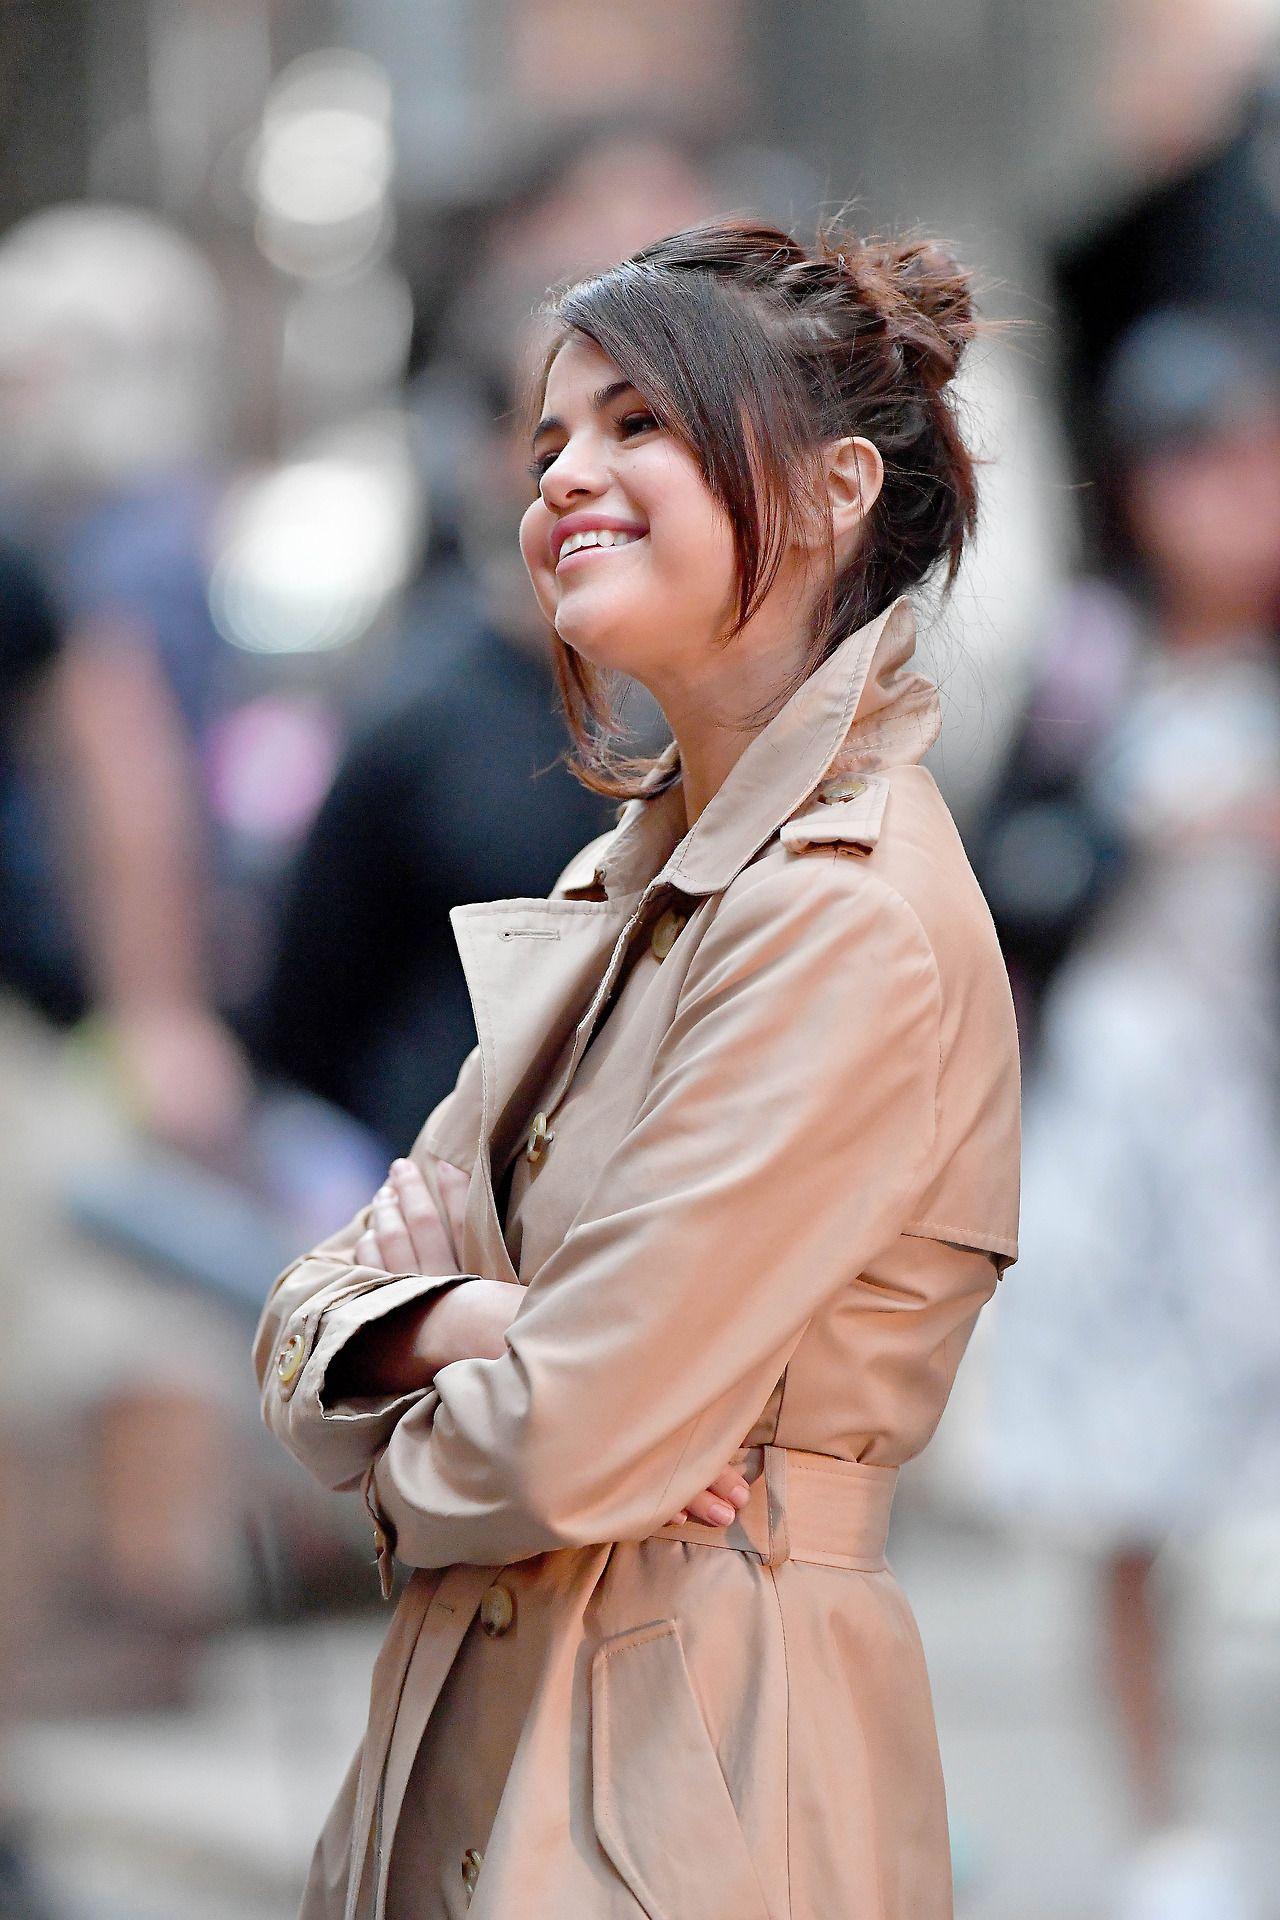 September 11 Selena on set of Woody Allen's film in New